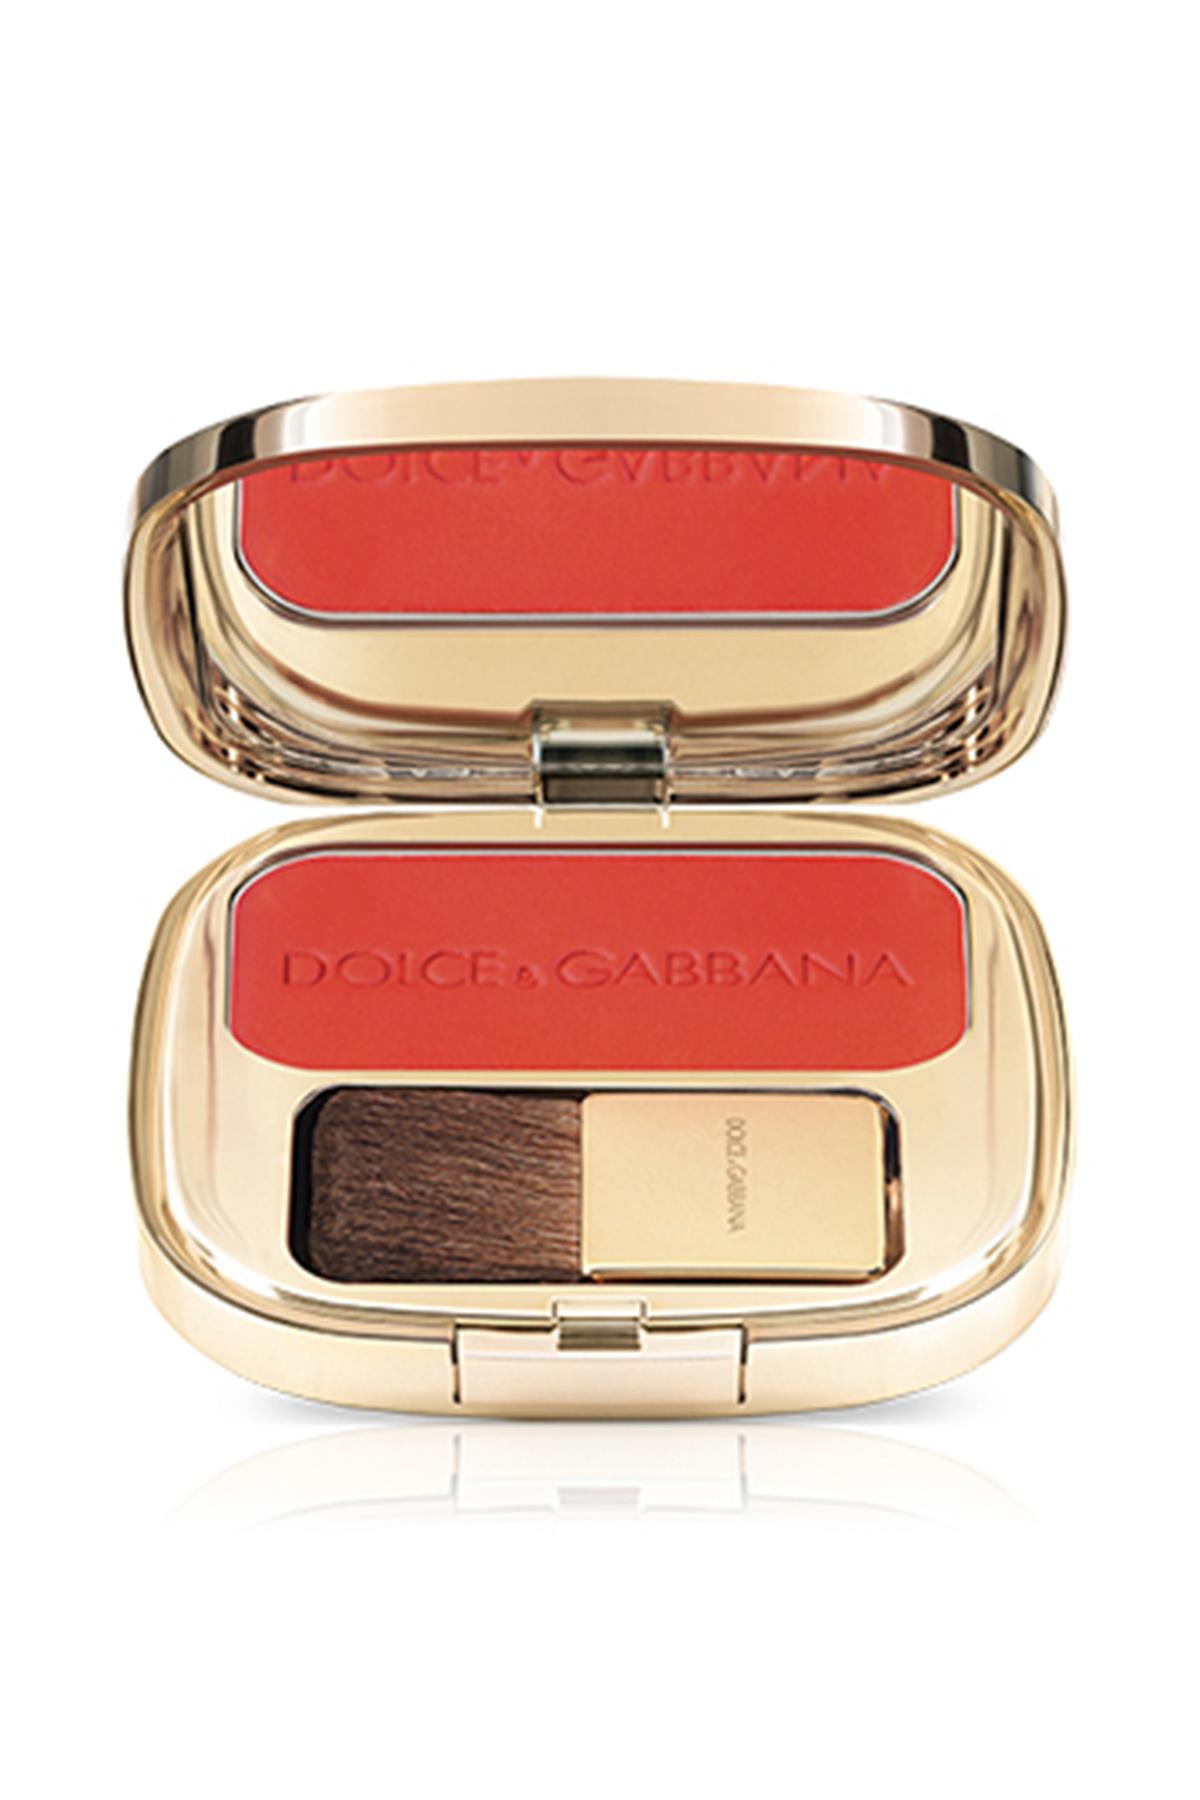 Dolce Gabbana The Blush Luminous Cheek Colour Allık 15 Sole